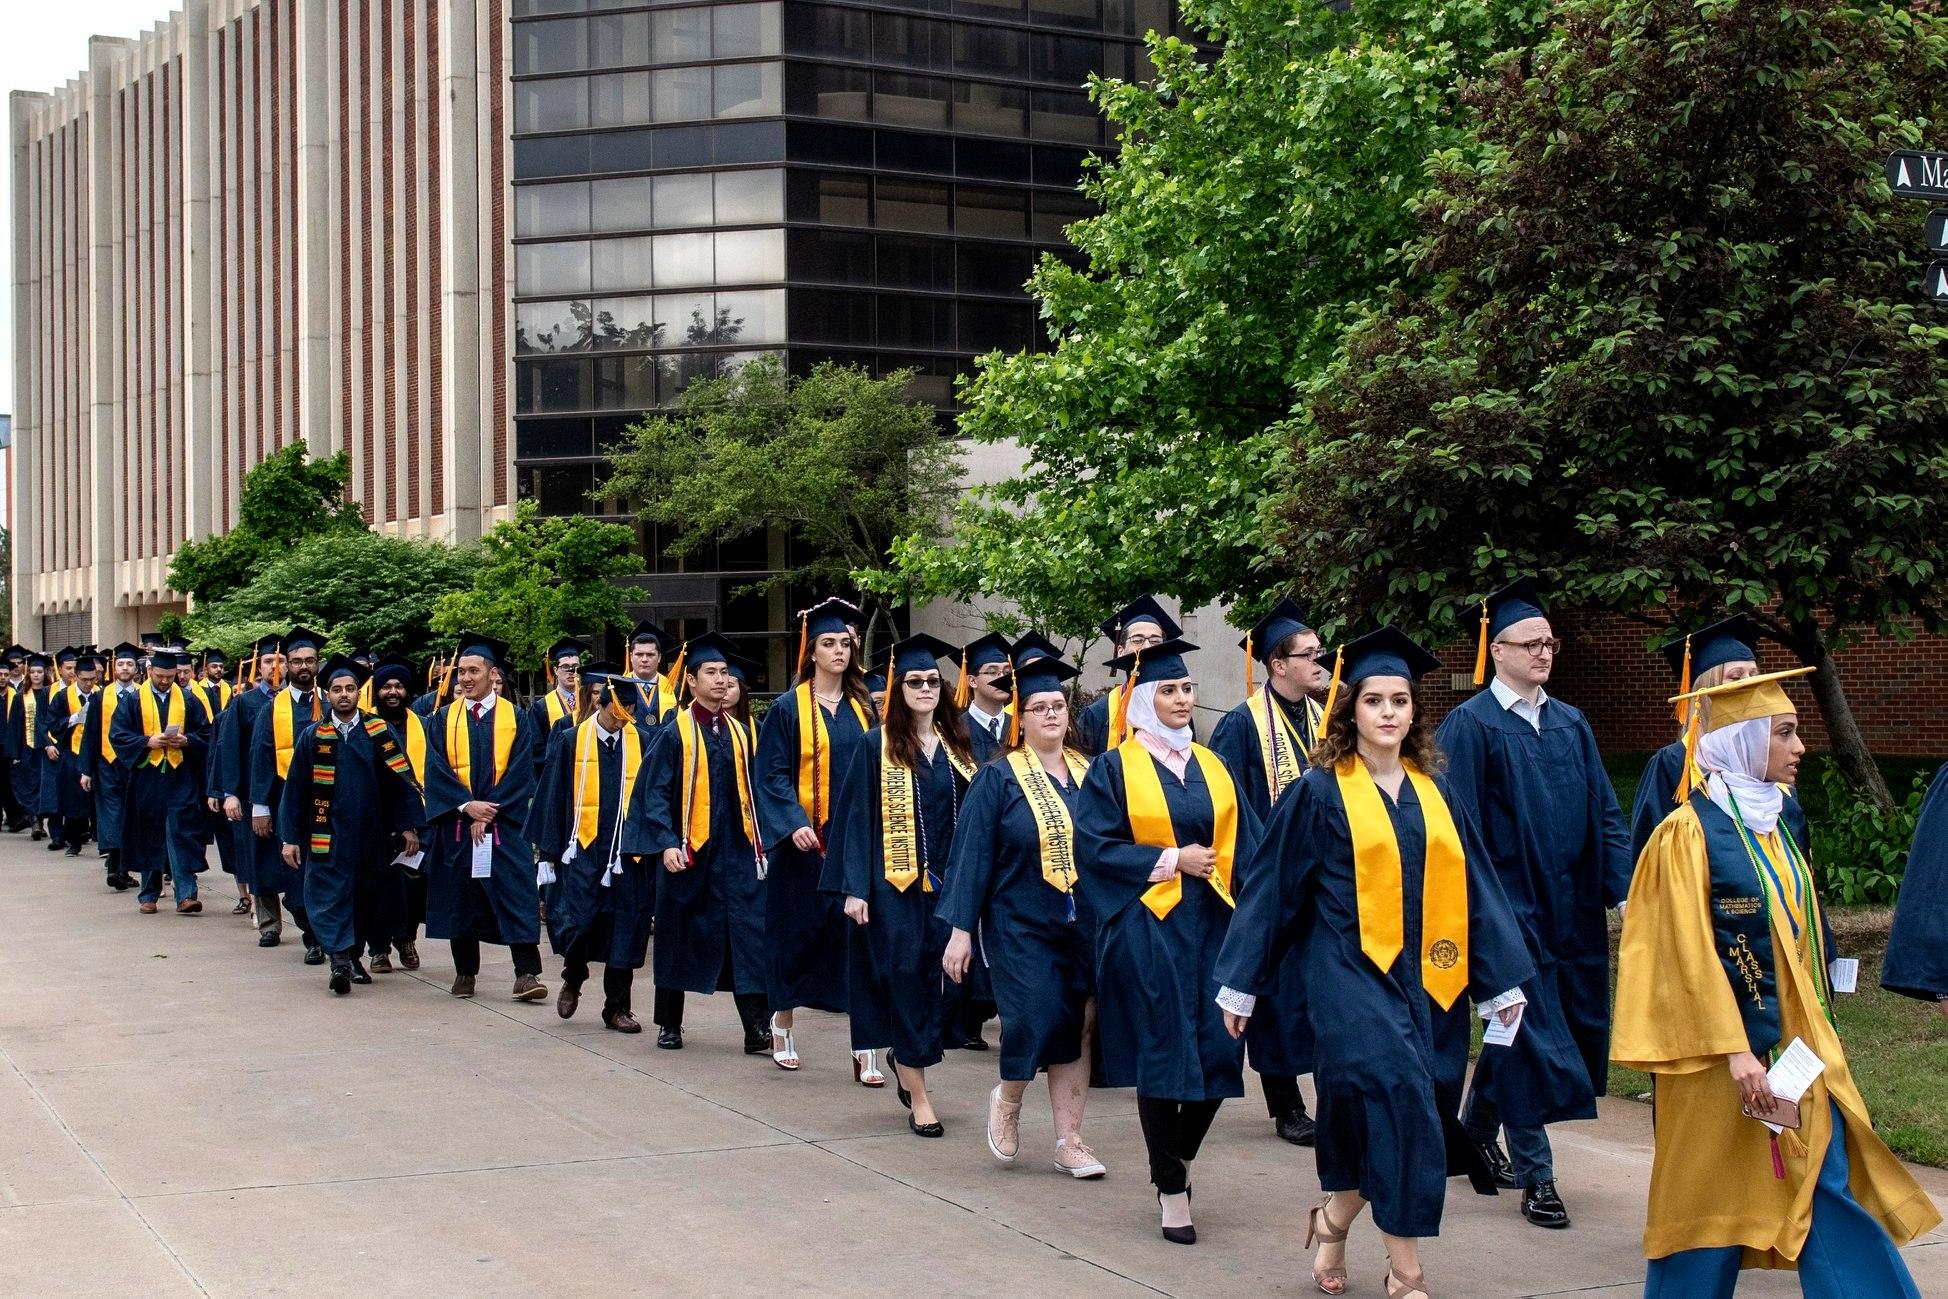 cms graduates